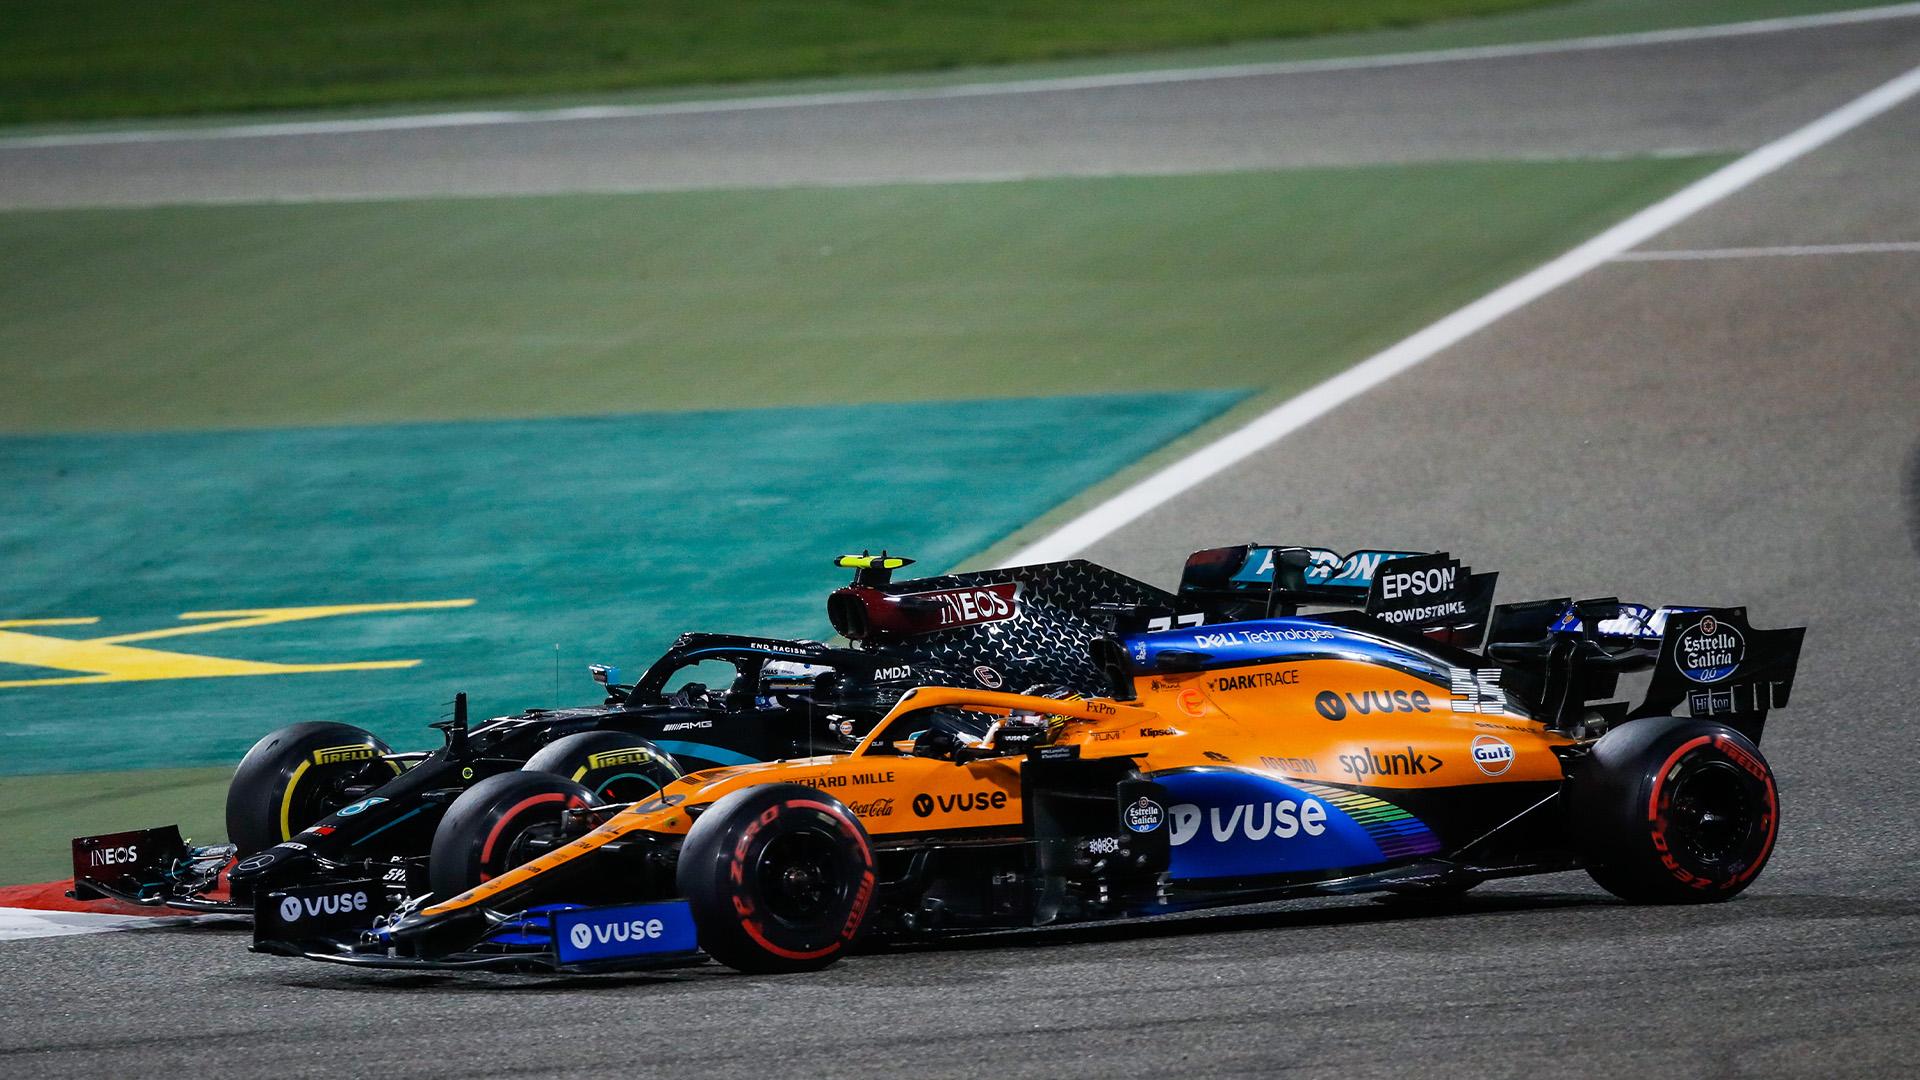 Valtteri Bottas battles with Carlos Sainz in the 2020 Sakhir Grand prix